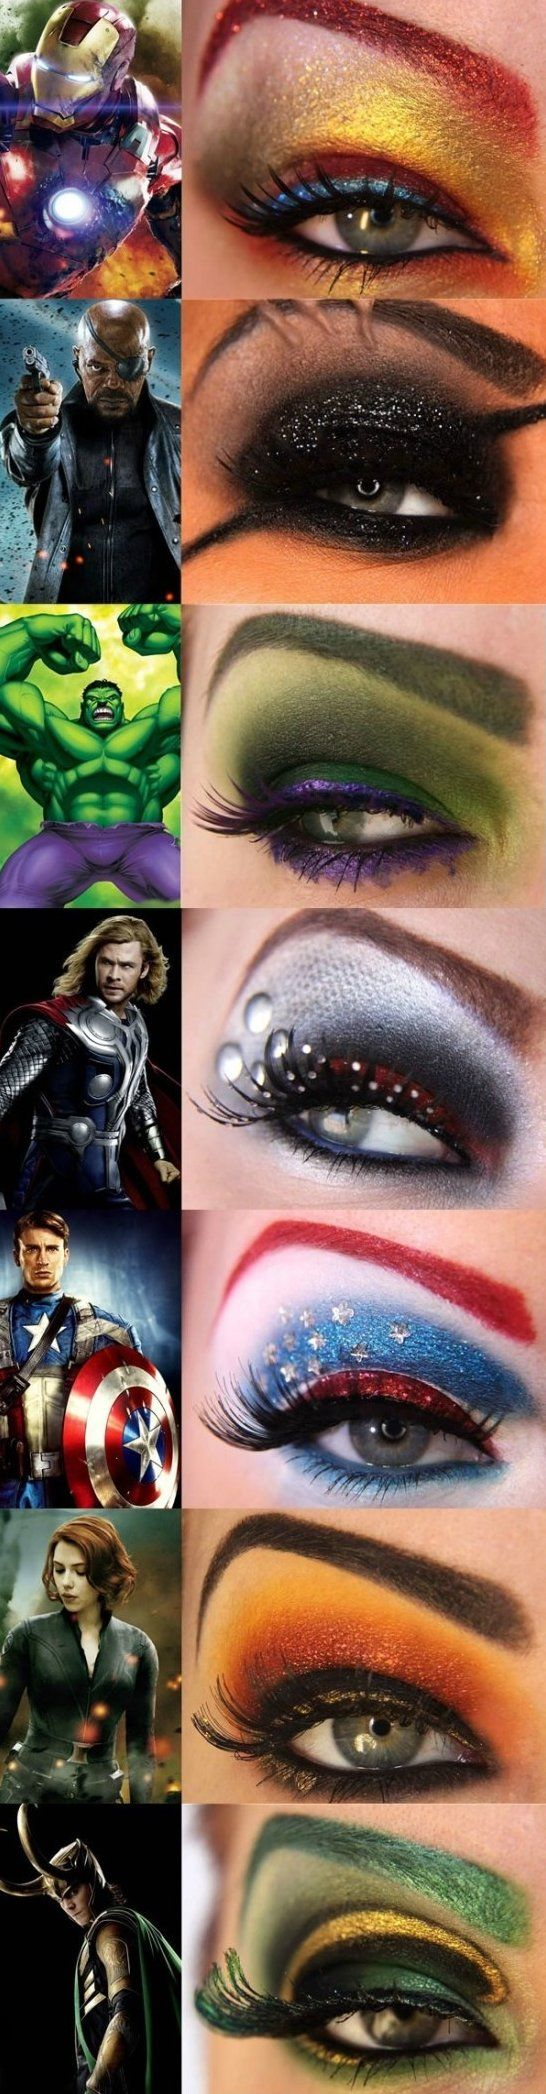 Avengers Eye Makeup - www.meme-lol.com